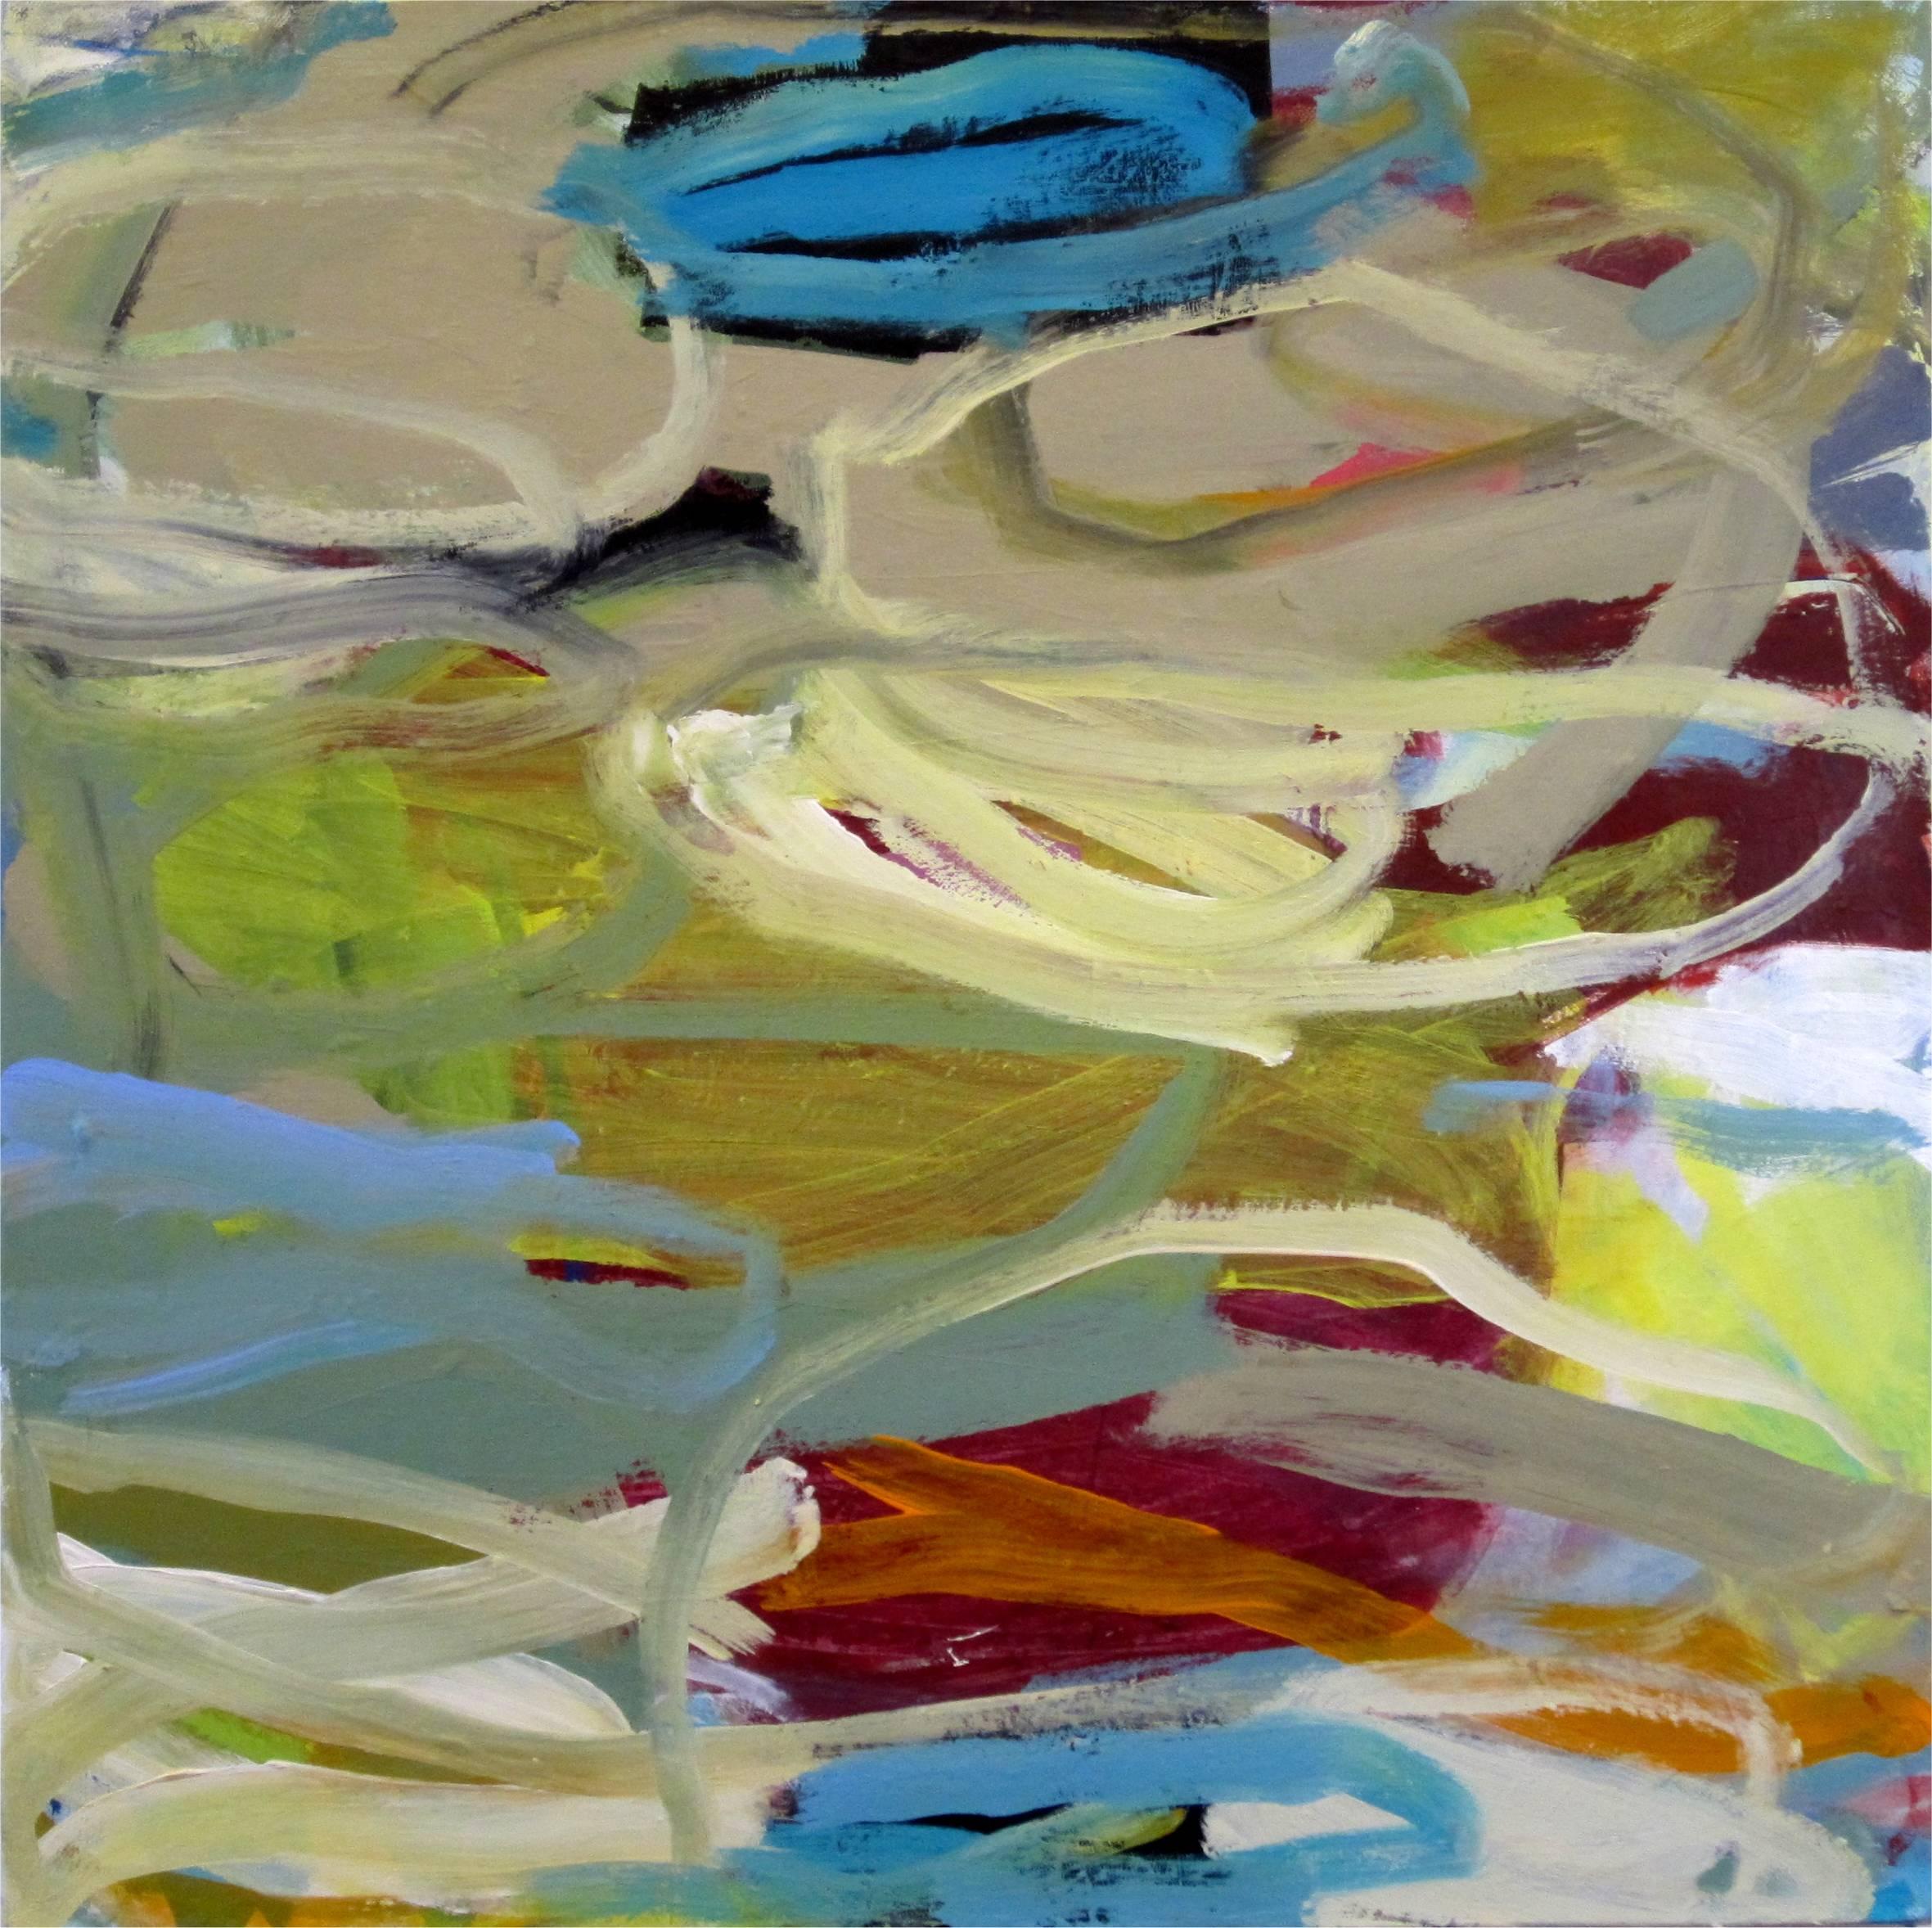 19_2012_Acryl auf Lwd 60x60